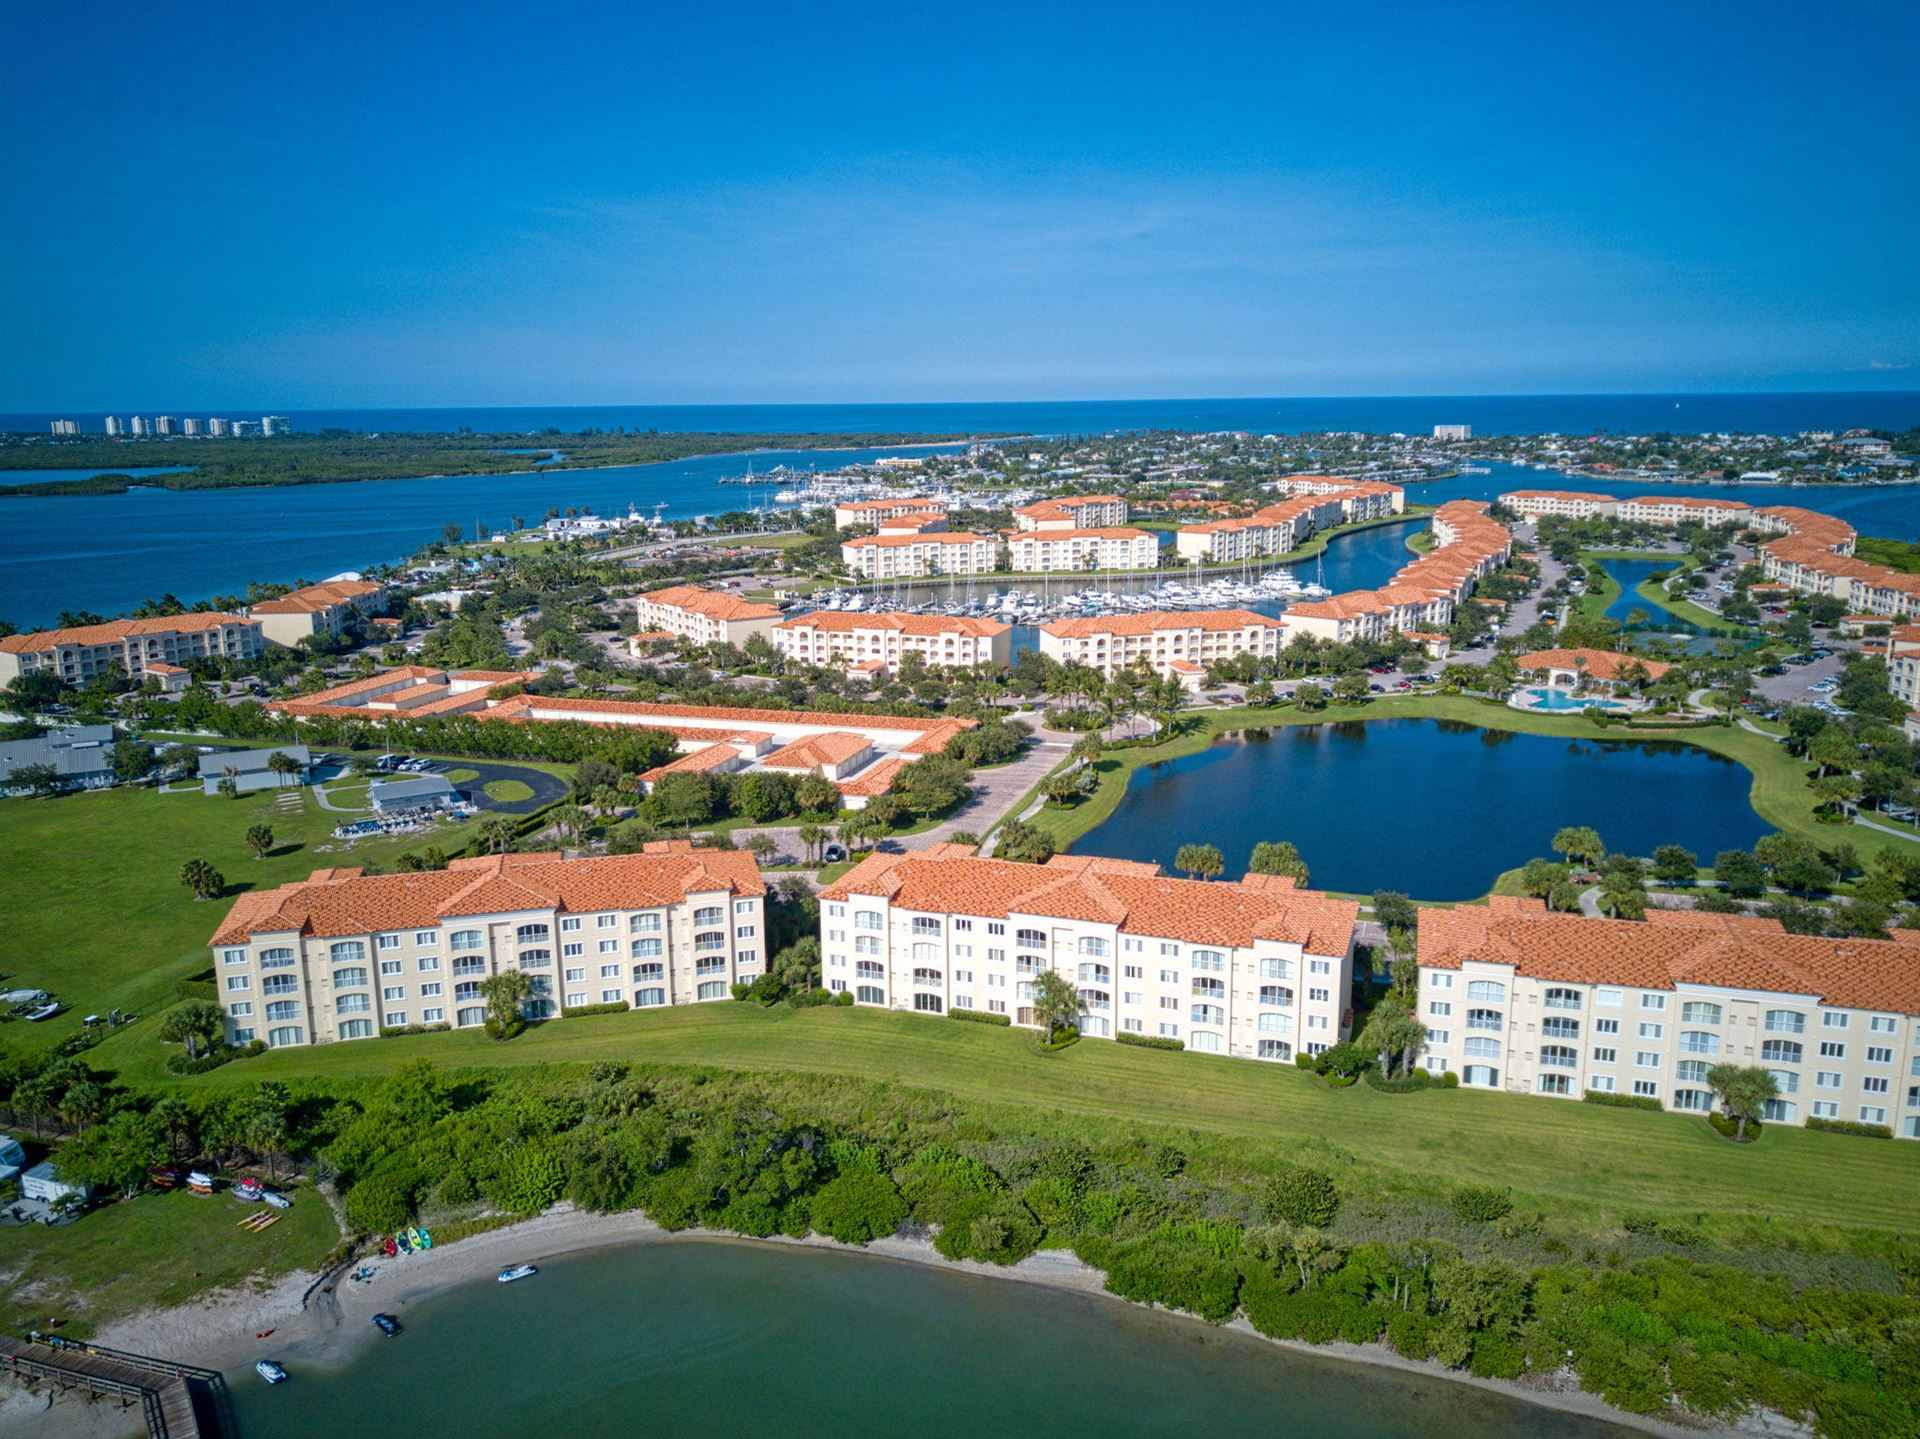 34 Harbour Isle Dr W #304, Fort Pierce, FL 34949 - #: RX-10653104